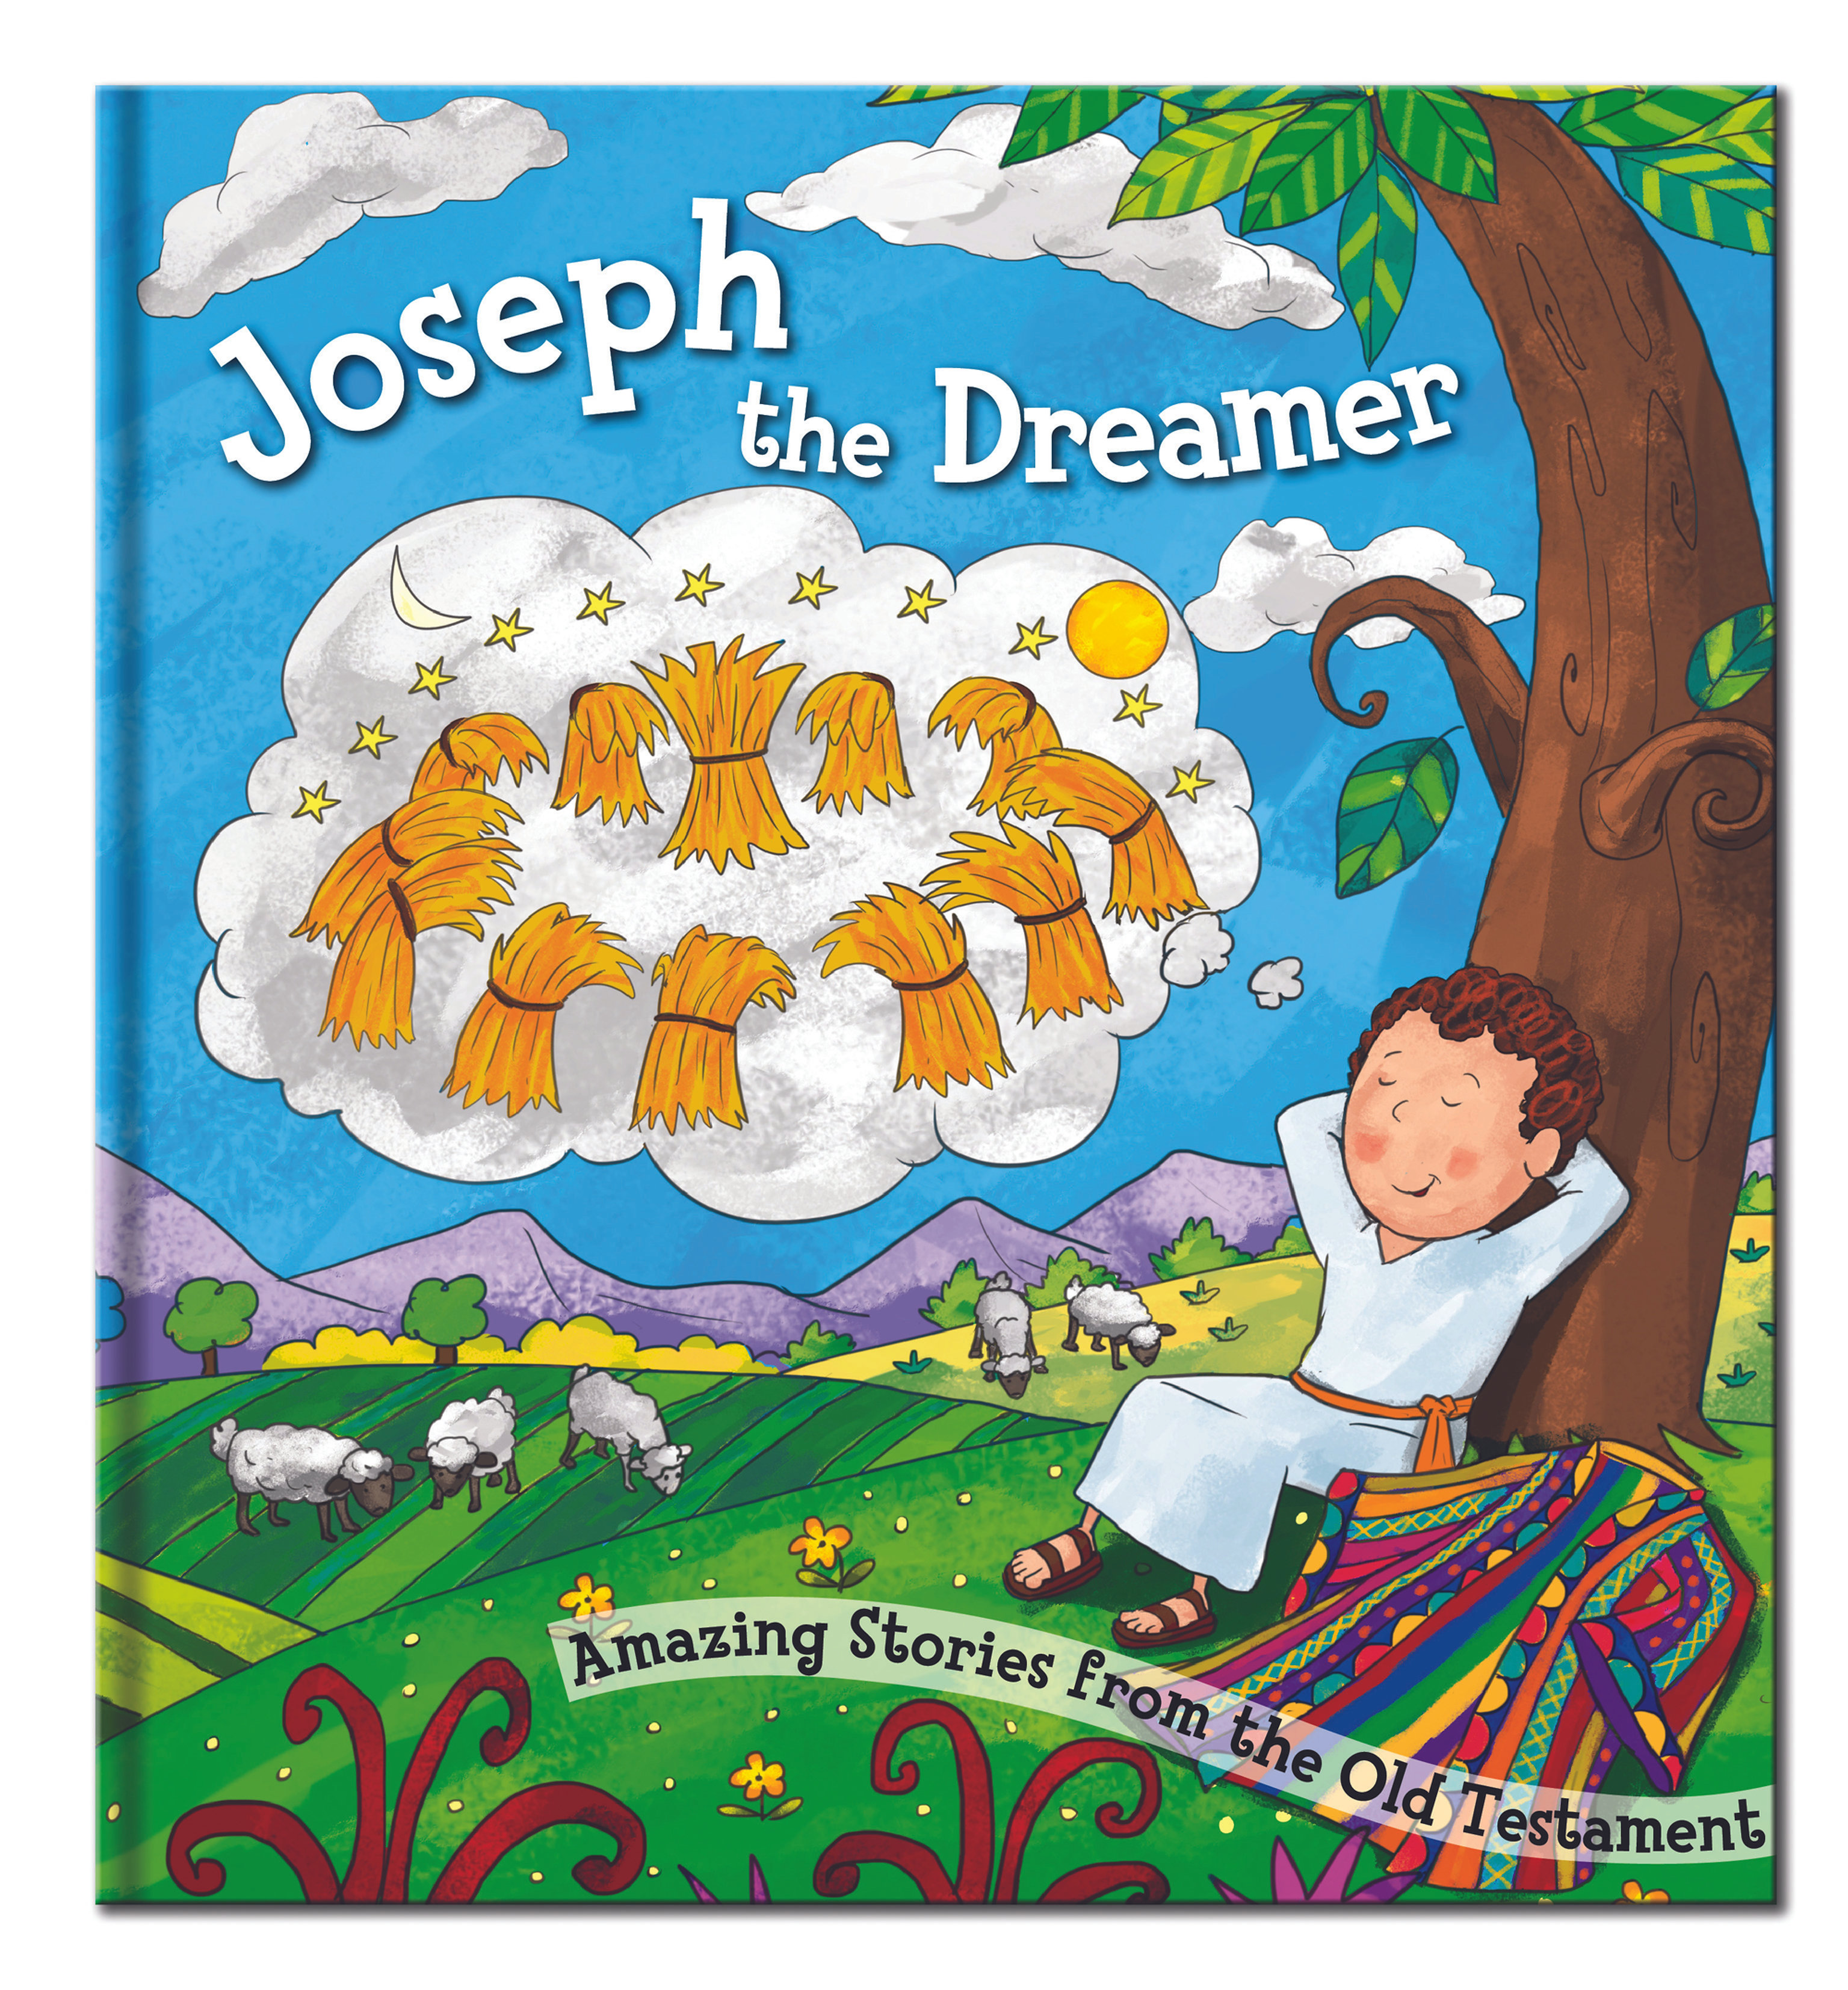 north parade publishing joseph the dreamer bible story book